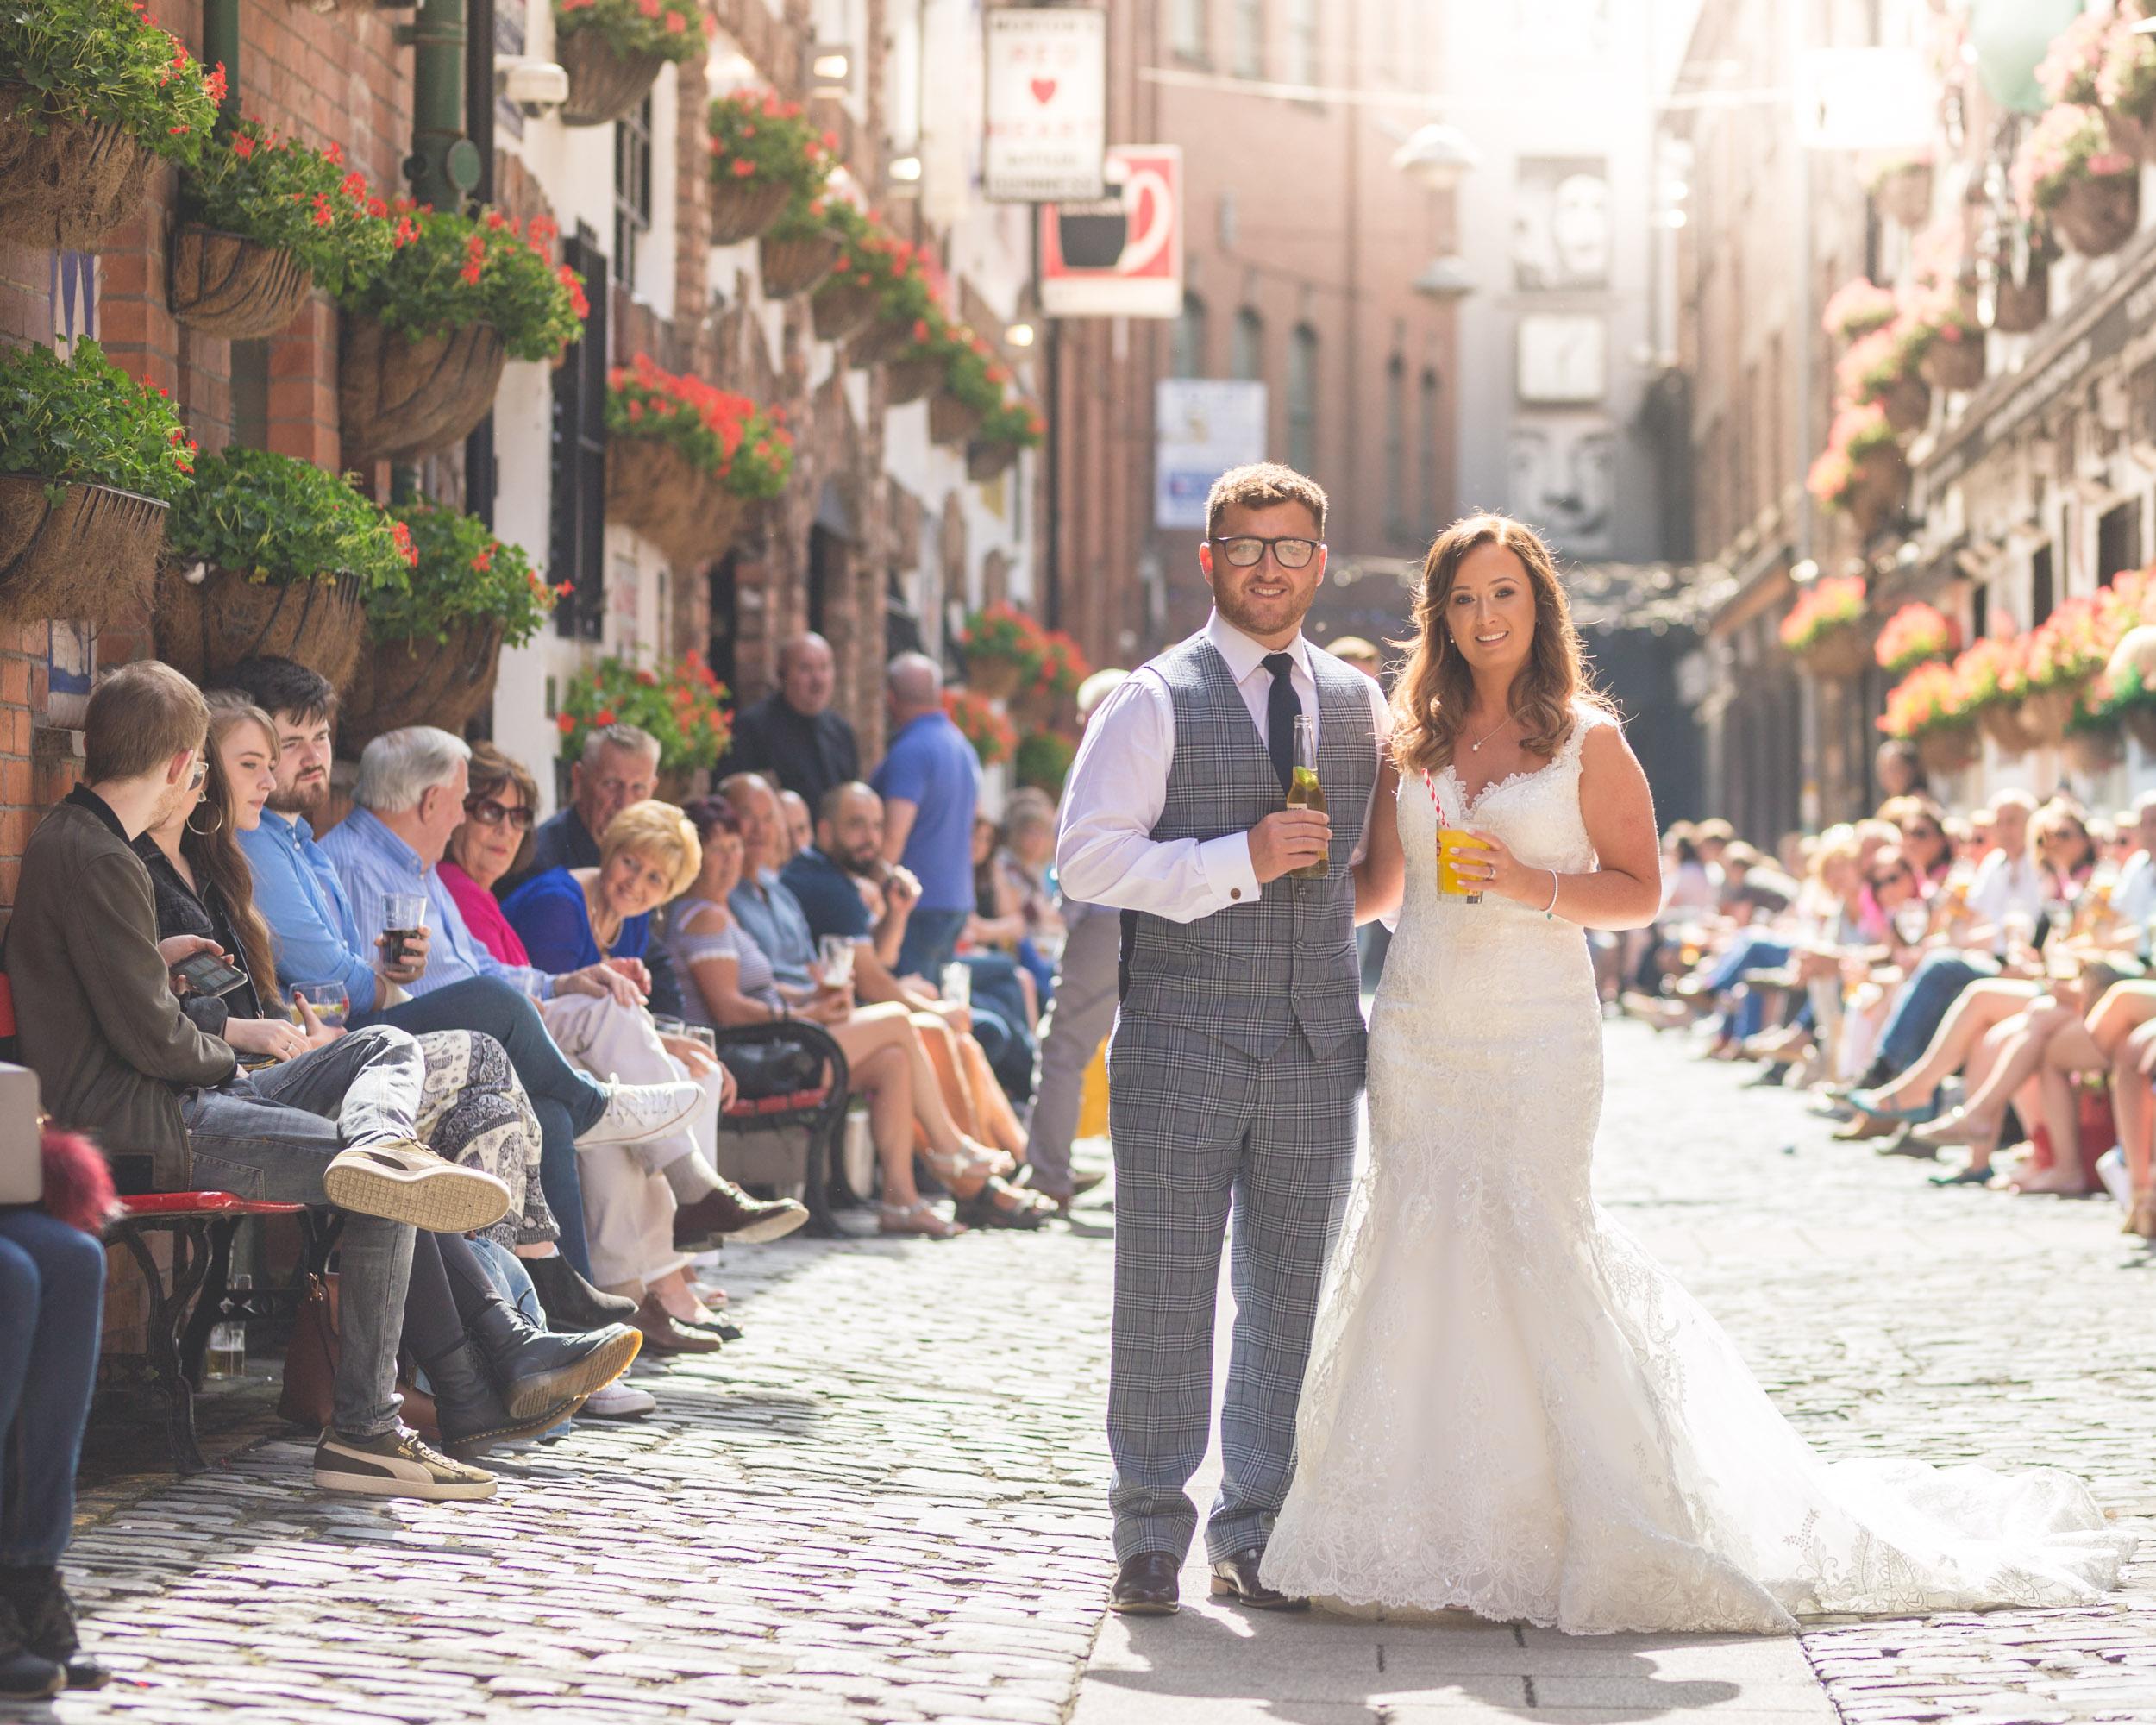 Brian McEwan   Northern Ireland Wedding Photographer   Rebecca & Michael   Portraits-105.jpg